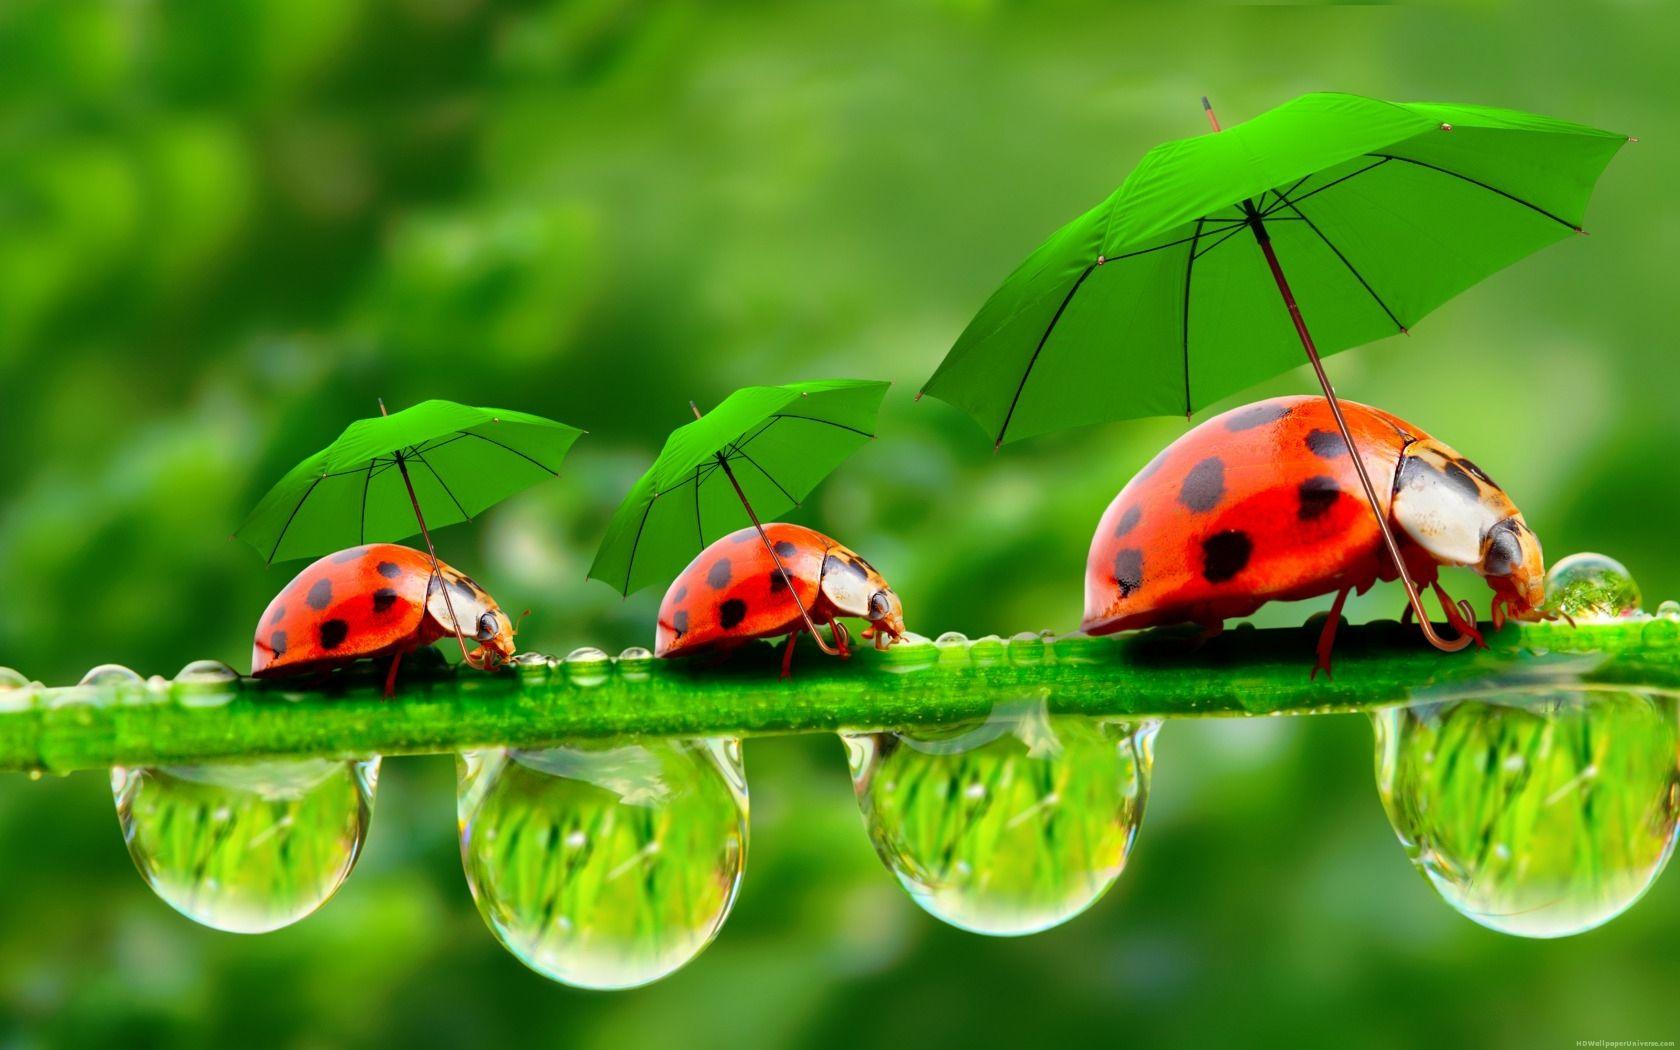 Ladybugs With Green Umbrellas HD Wallpaper